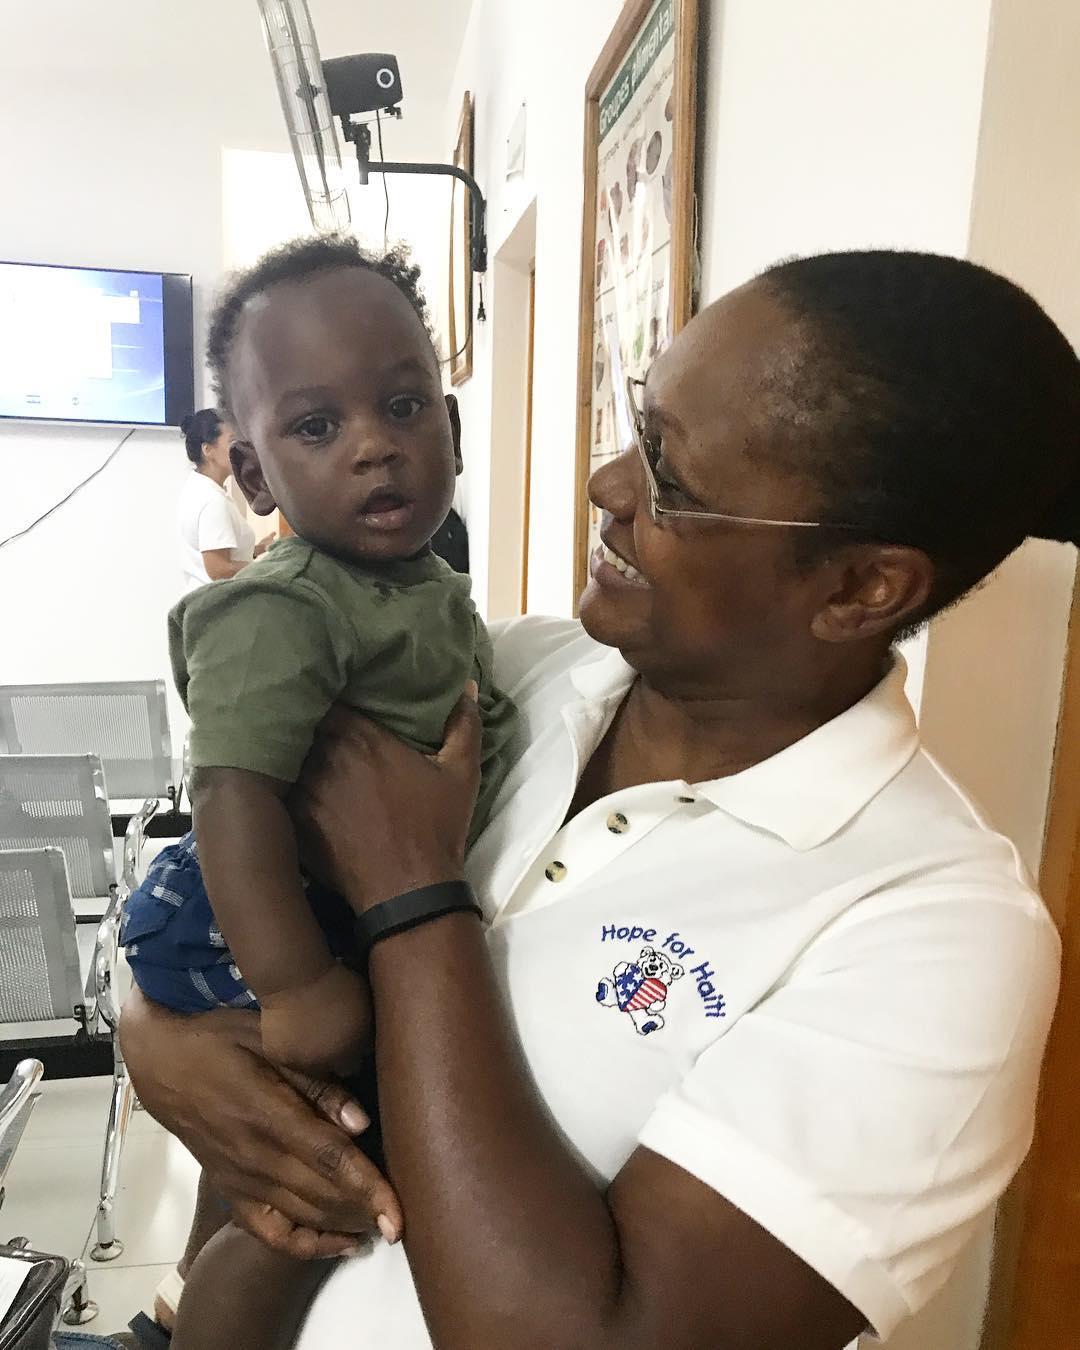 Wishing everyone a relaxing and happy sunday! #haiti #hopeforhaiti #sunday #familytime